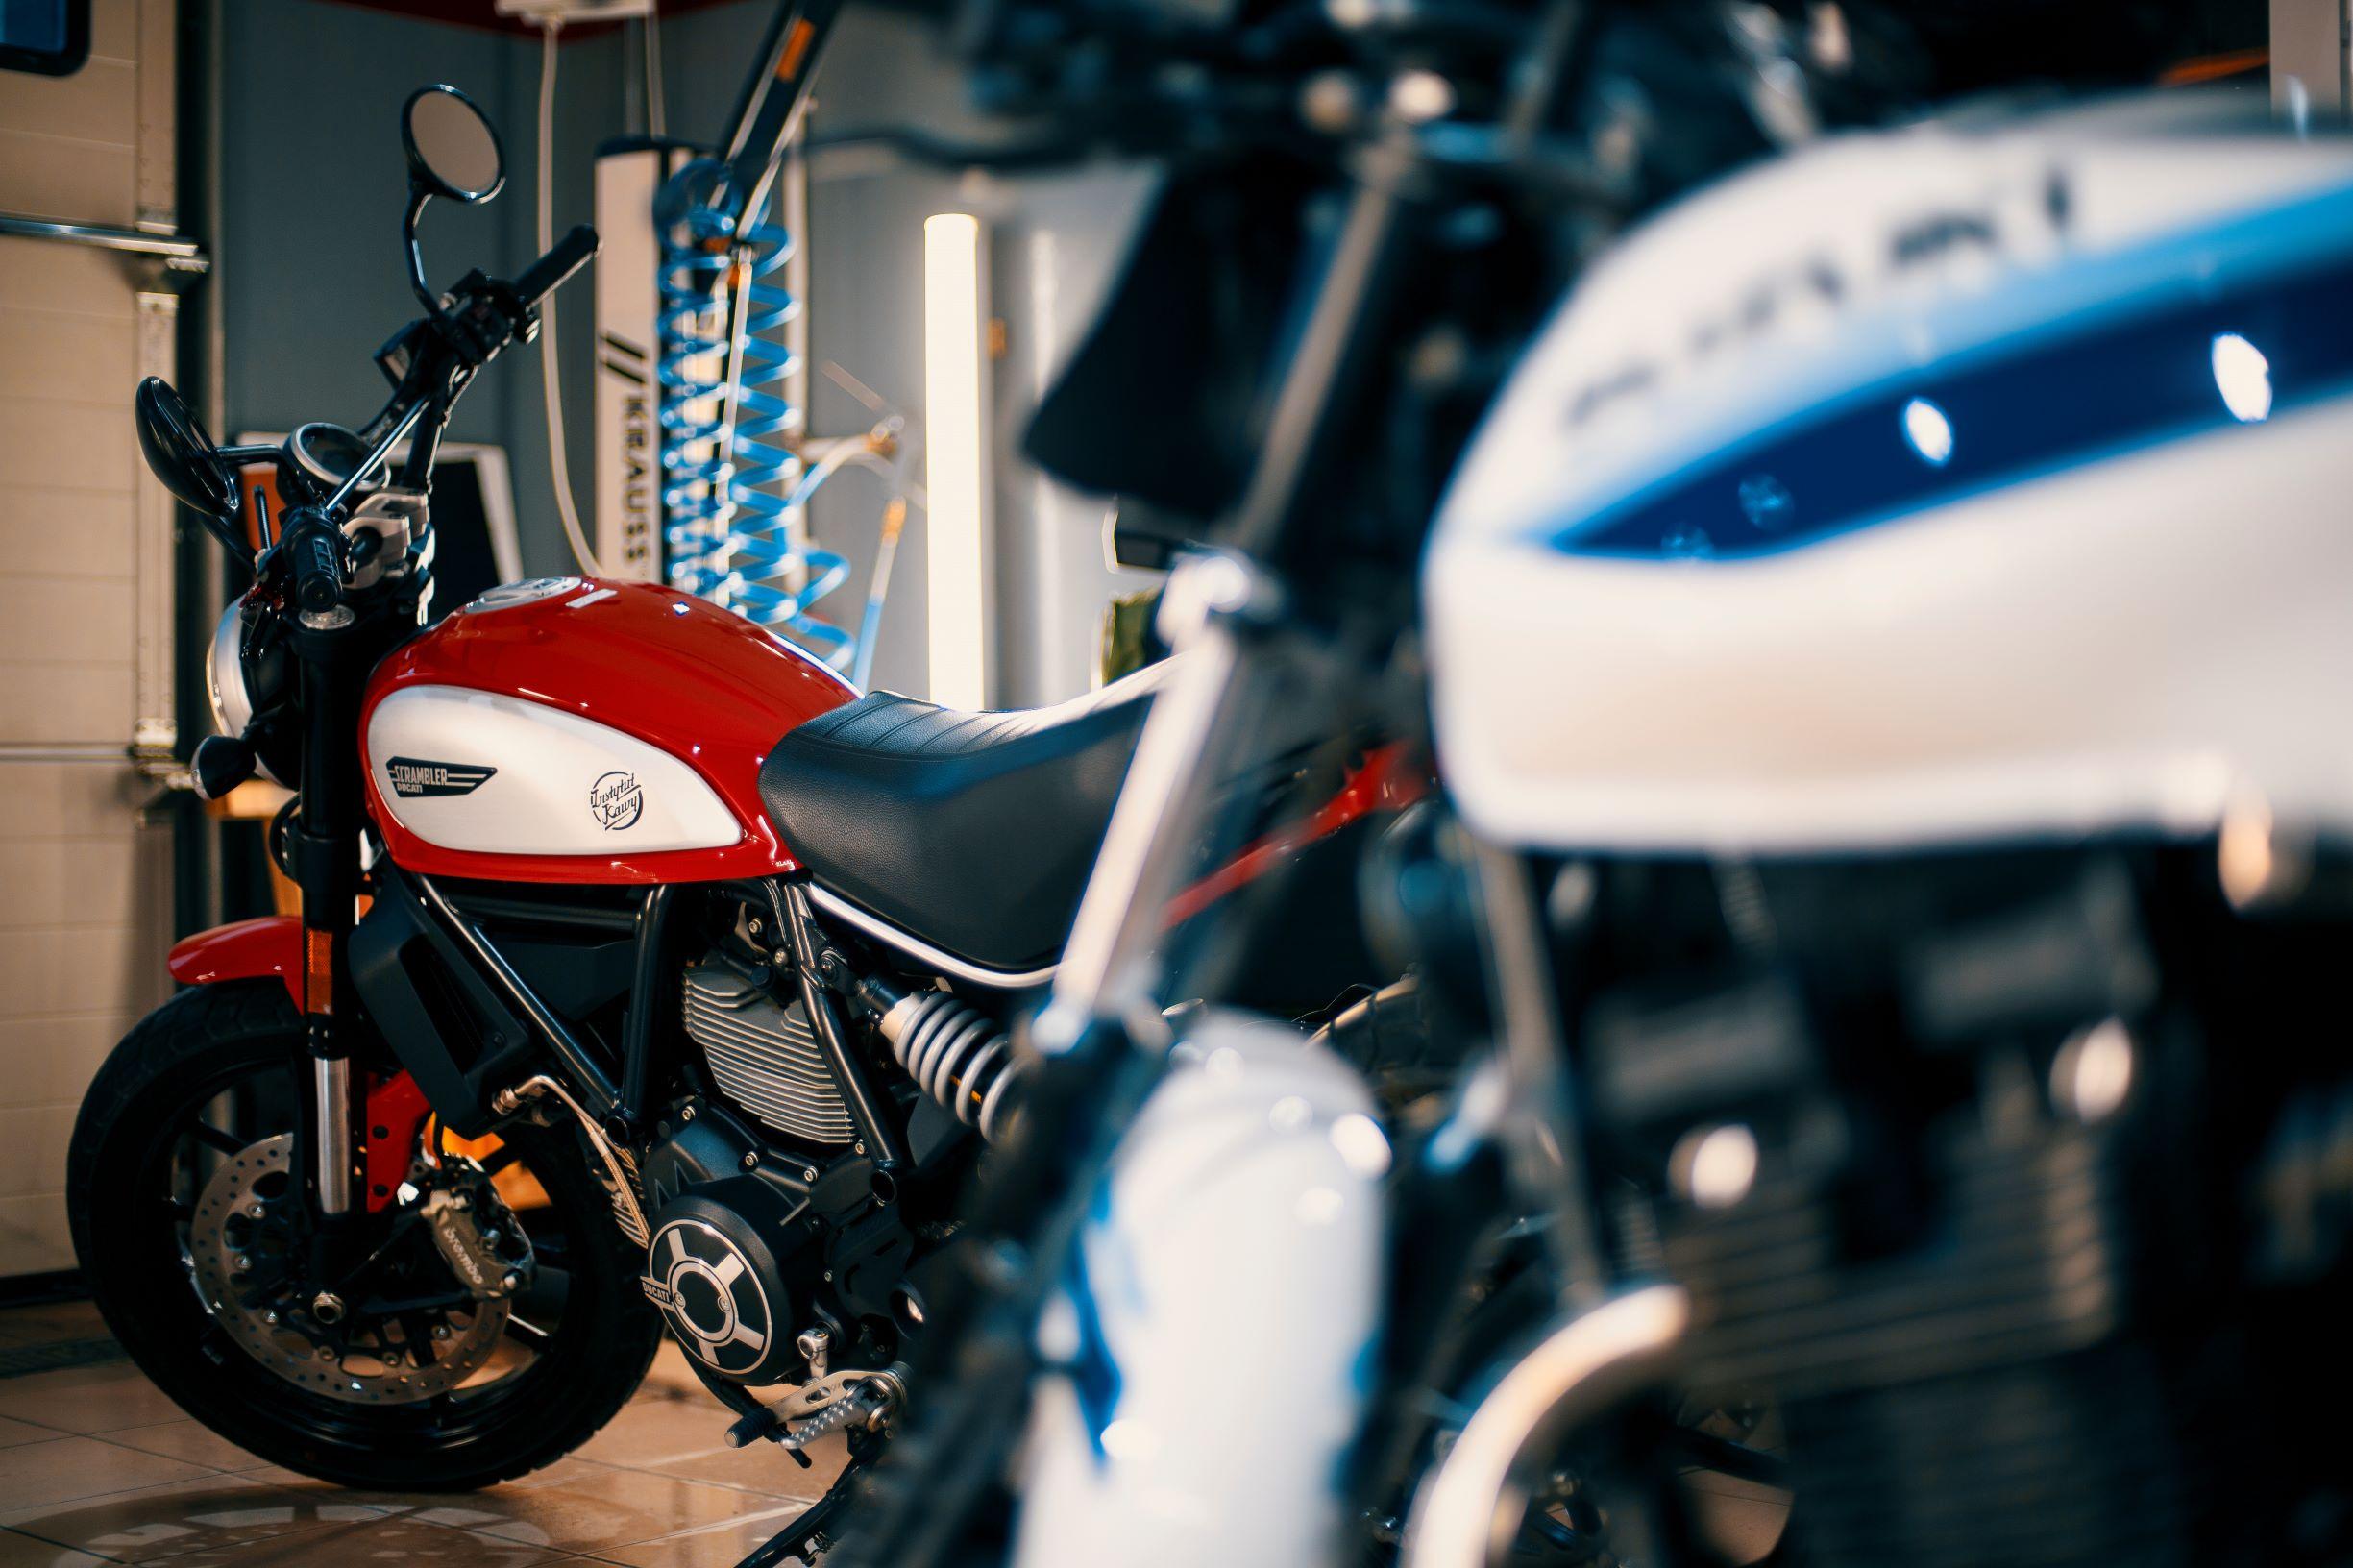 Motocykl Ducati Scrambler i motocykl Suzuki GSX